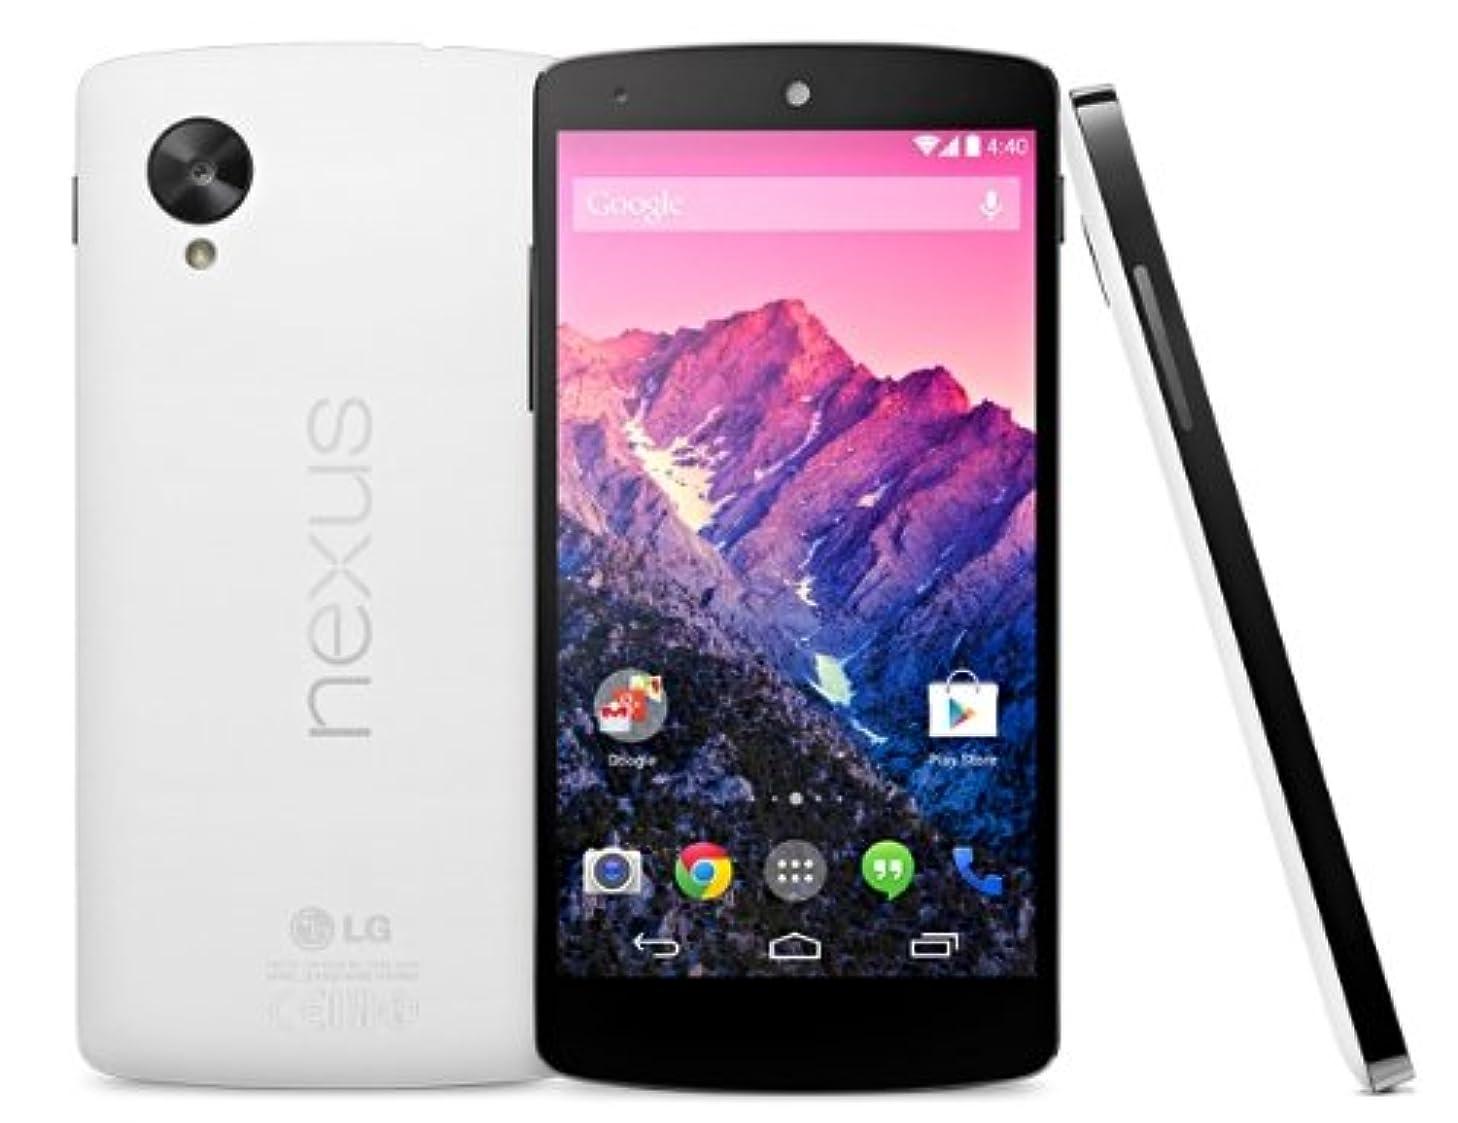 LG Google Nexus 5 D821 Factory Unlocked, 16GB, White - No 4G in USA - International Version No Warranty